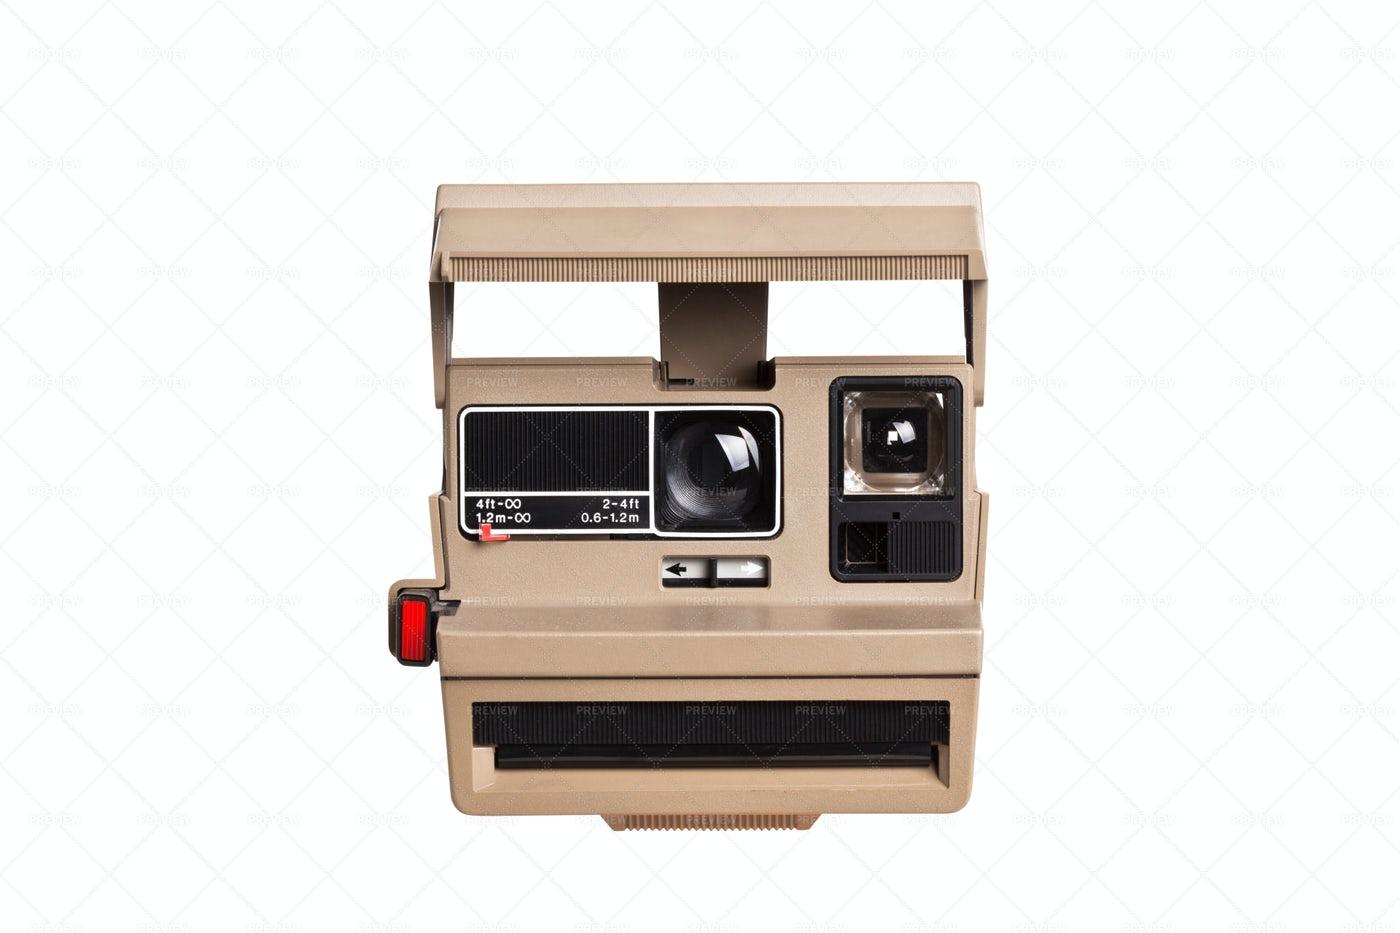 Instant Camera On White: Stock Photos